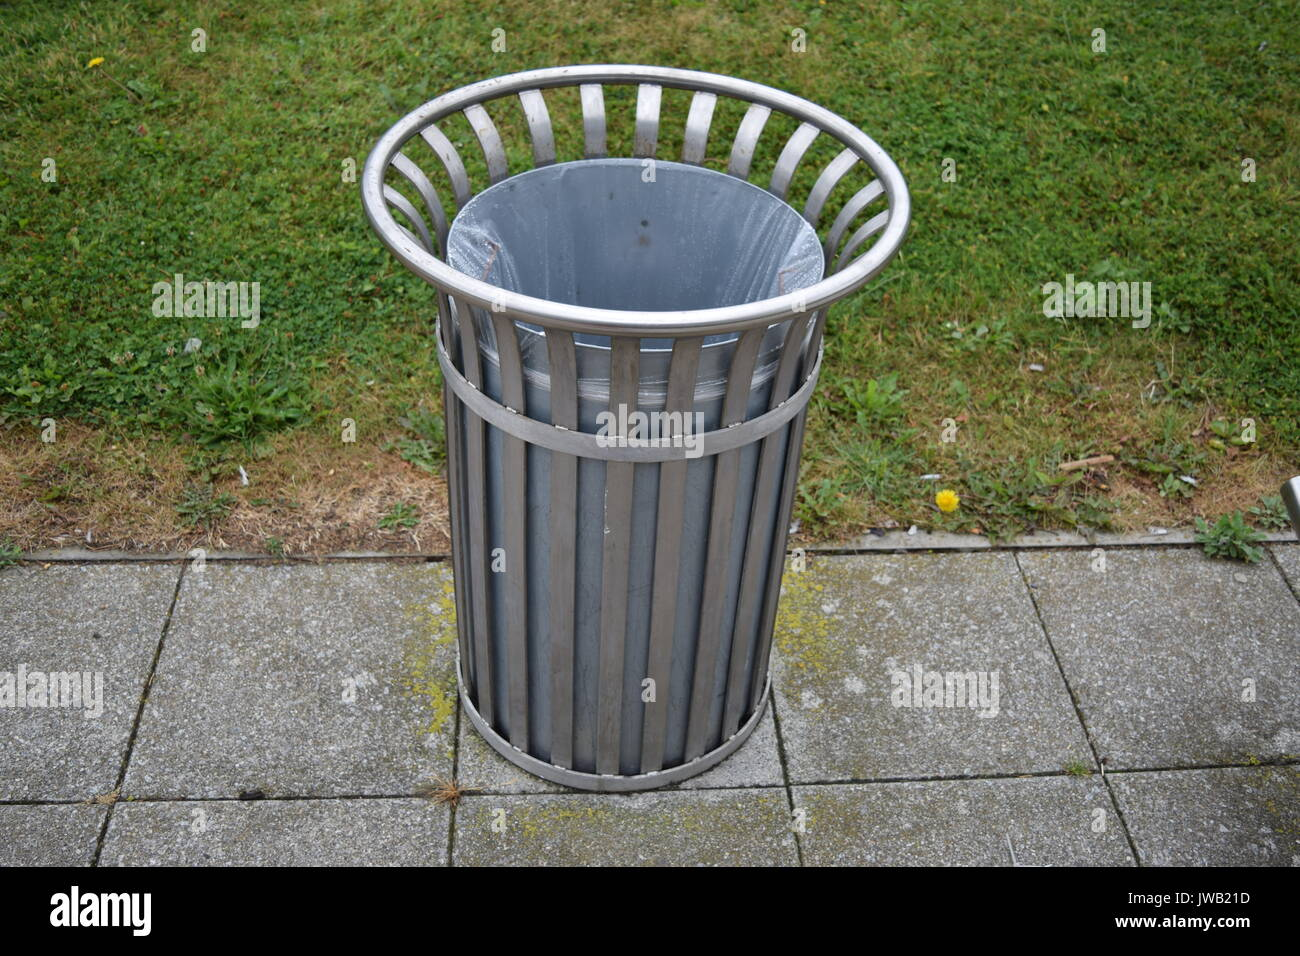 Metallic bin - Stock Image